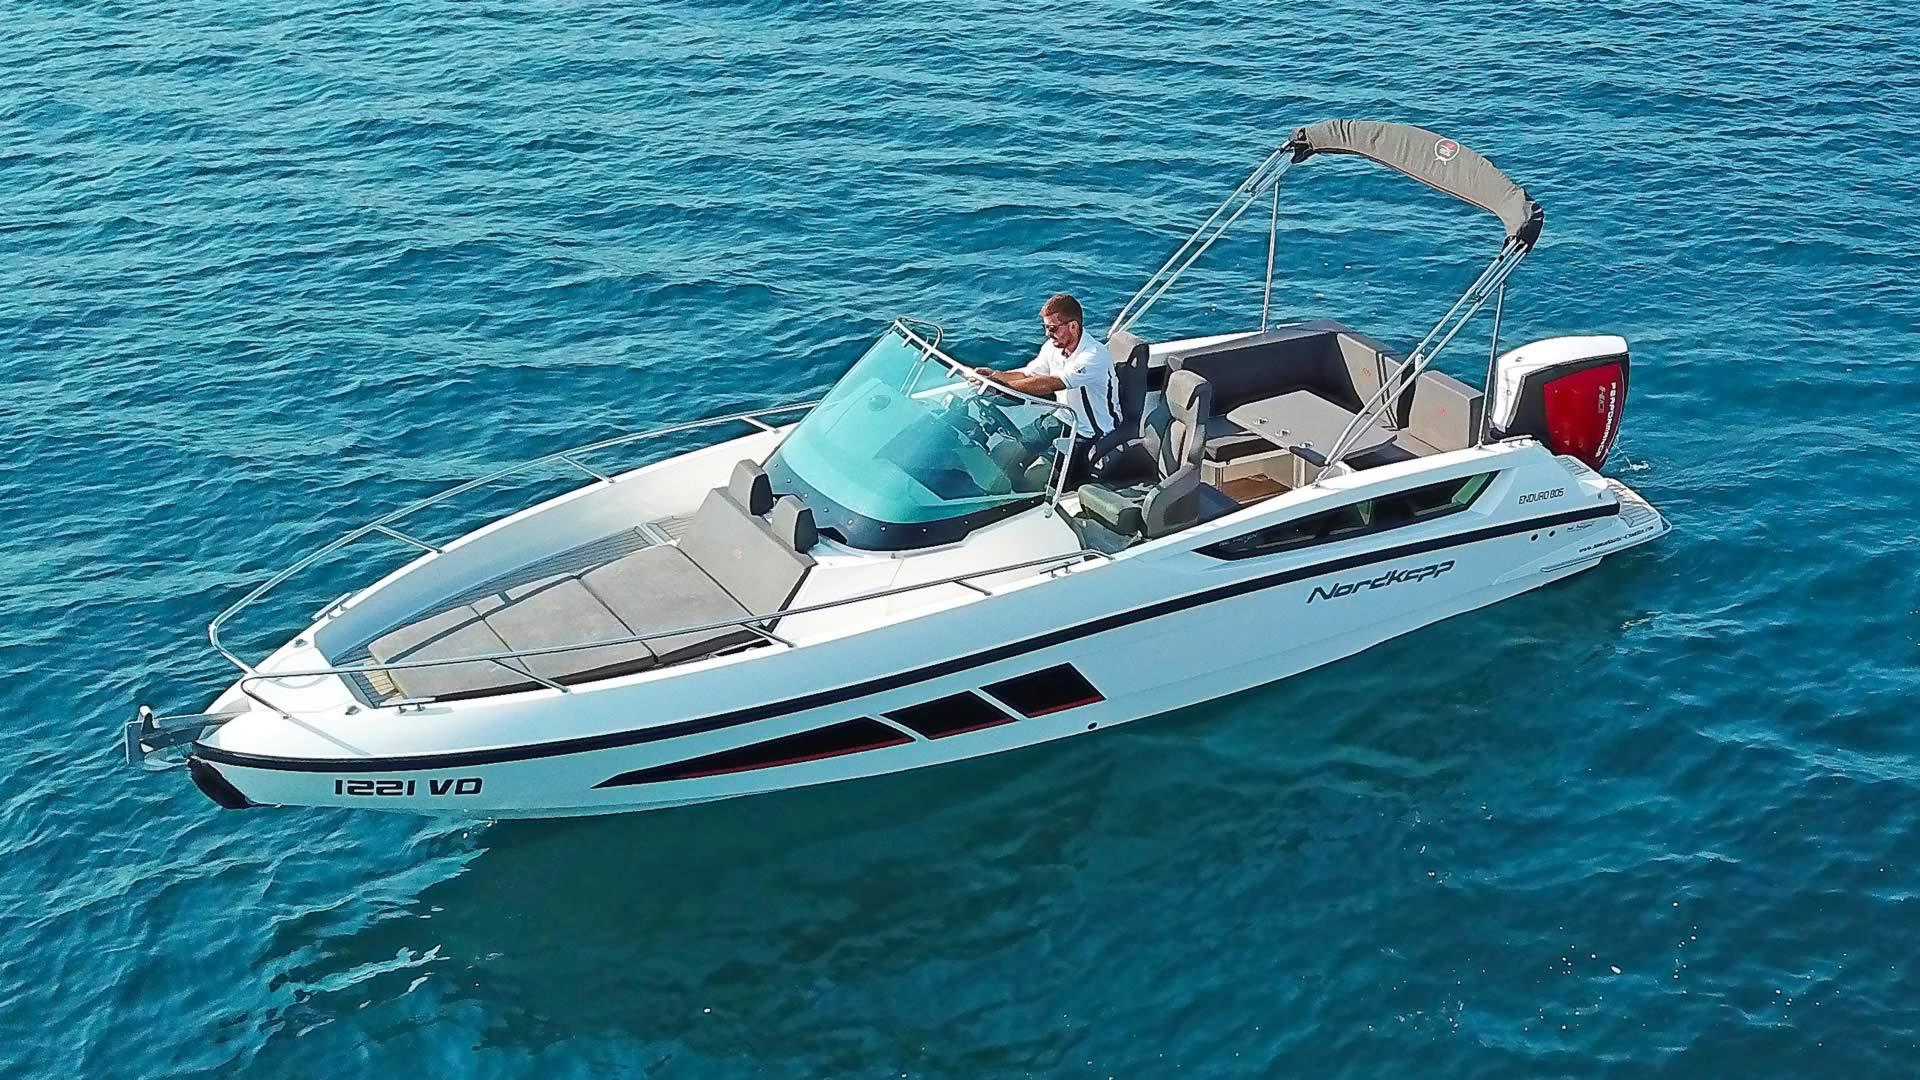 Sportboote & Motorboote Boot Charter in Kroatien - Boot Nordkapp 805 Enduro